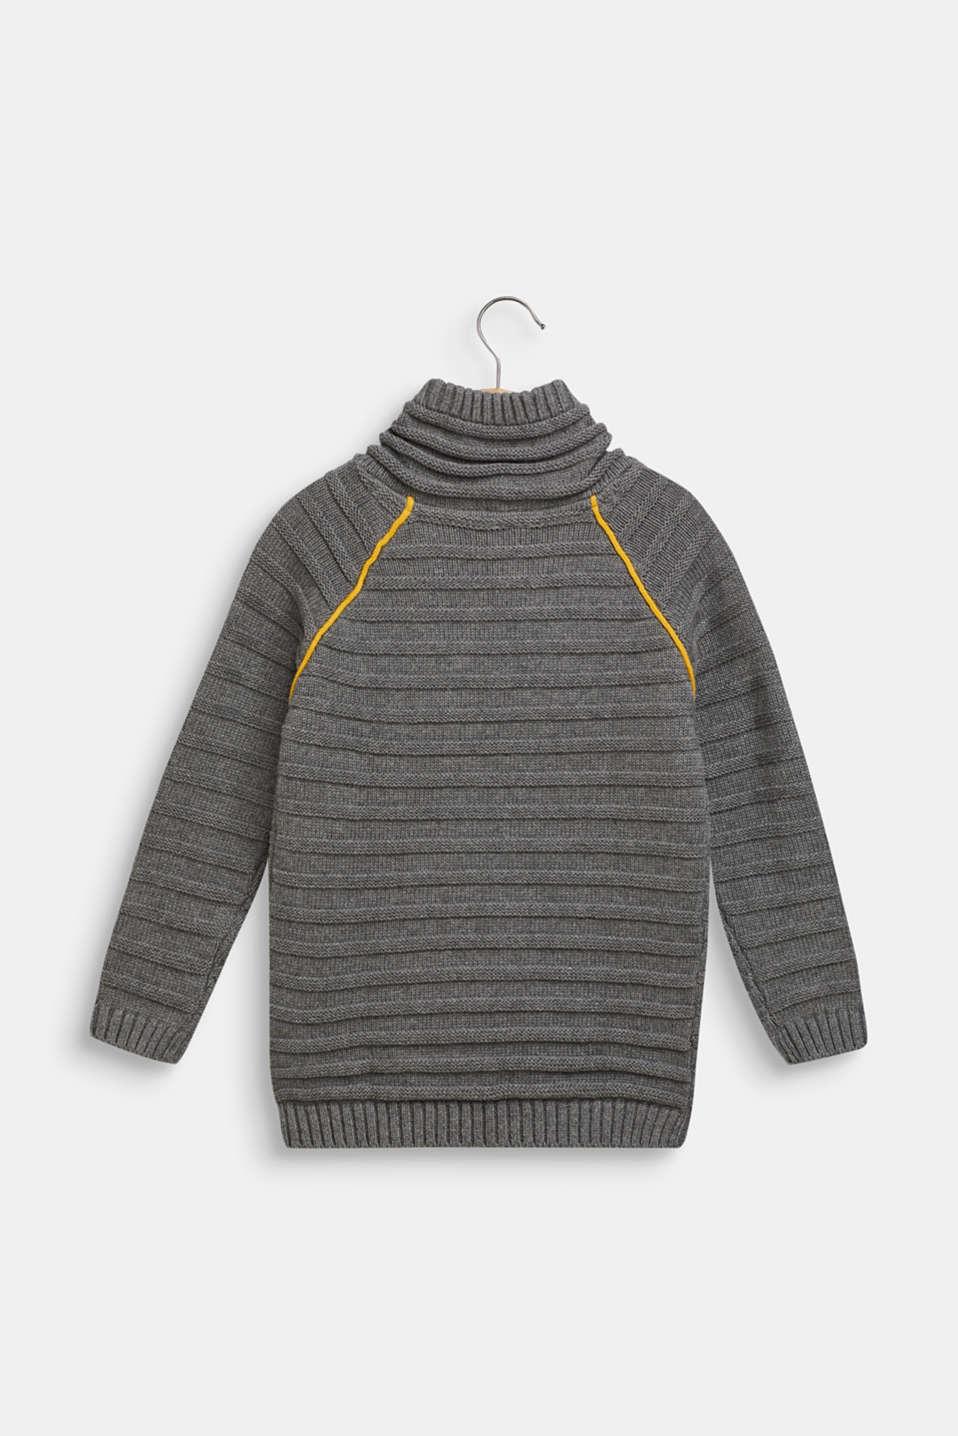 Ribbed shawl collar jumper, 100% cotton, DARK HEATHER G, detail image number 1